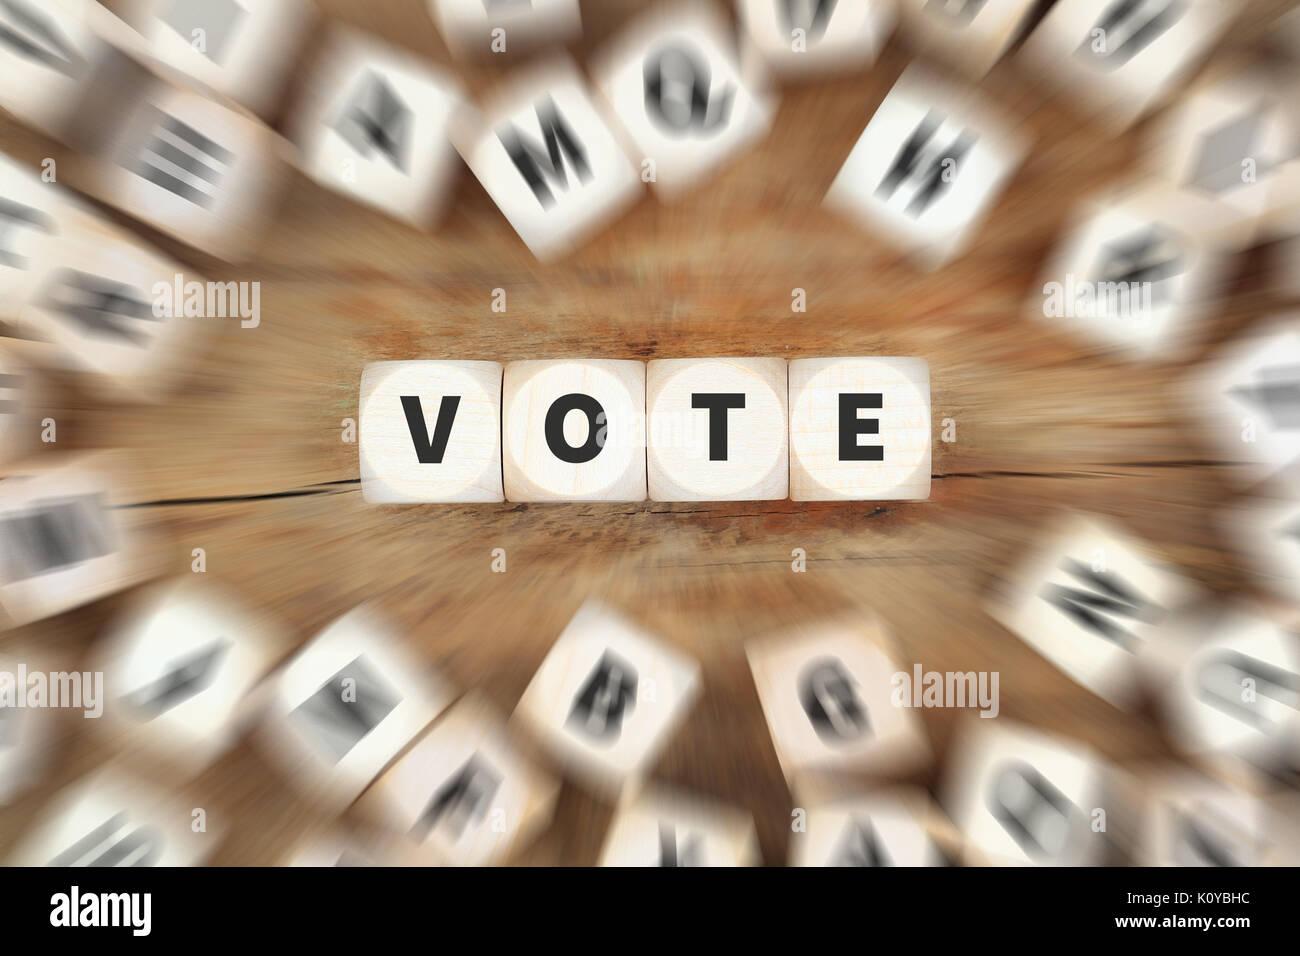 Vote election politics dice business concept idea - Stock Image